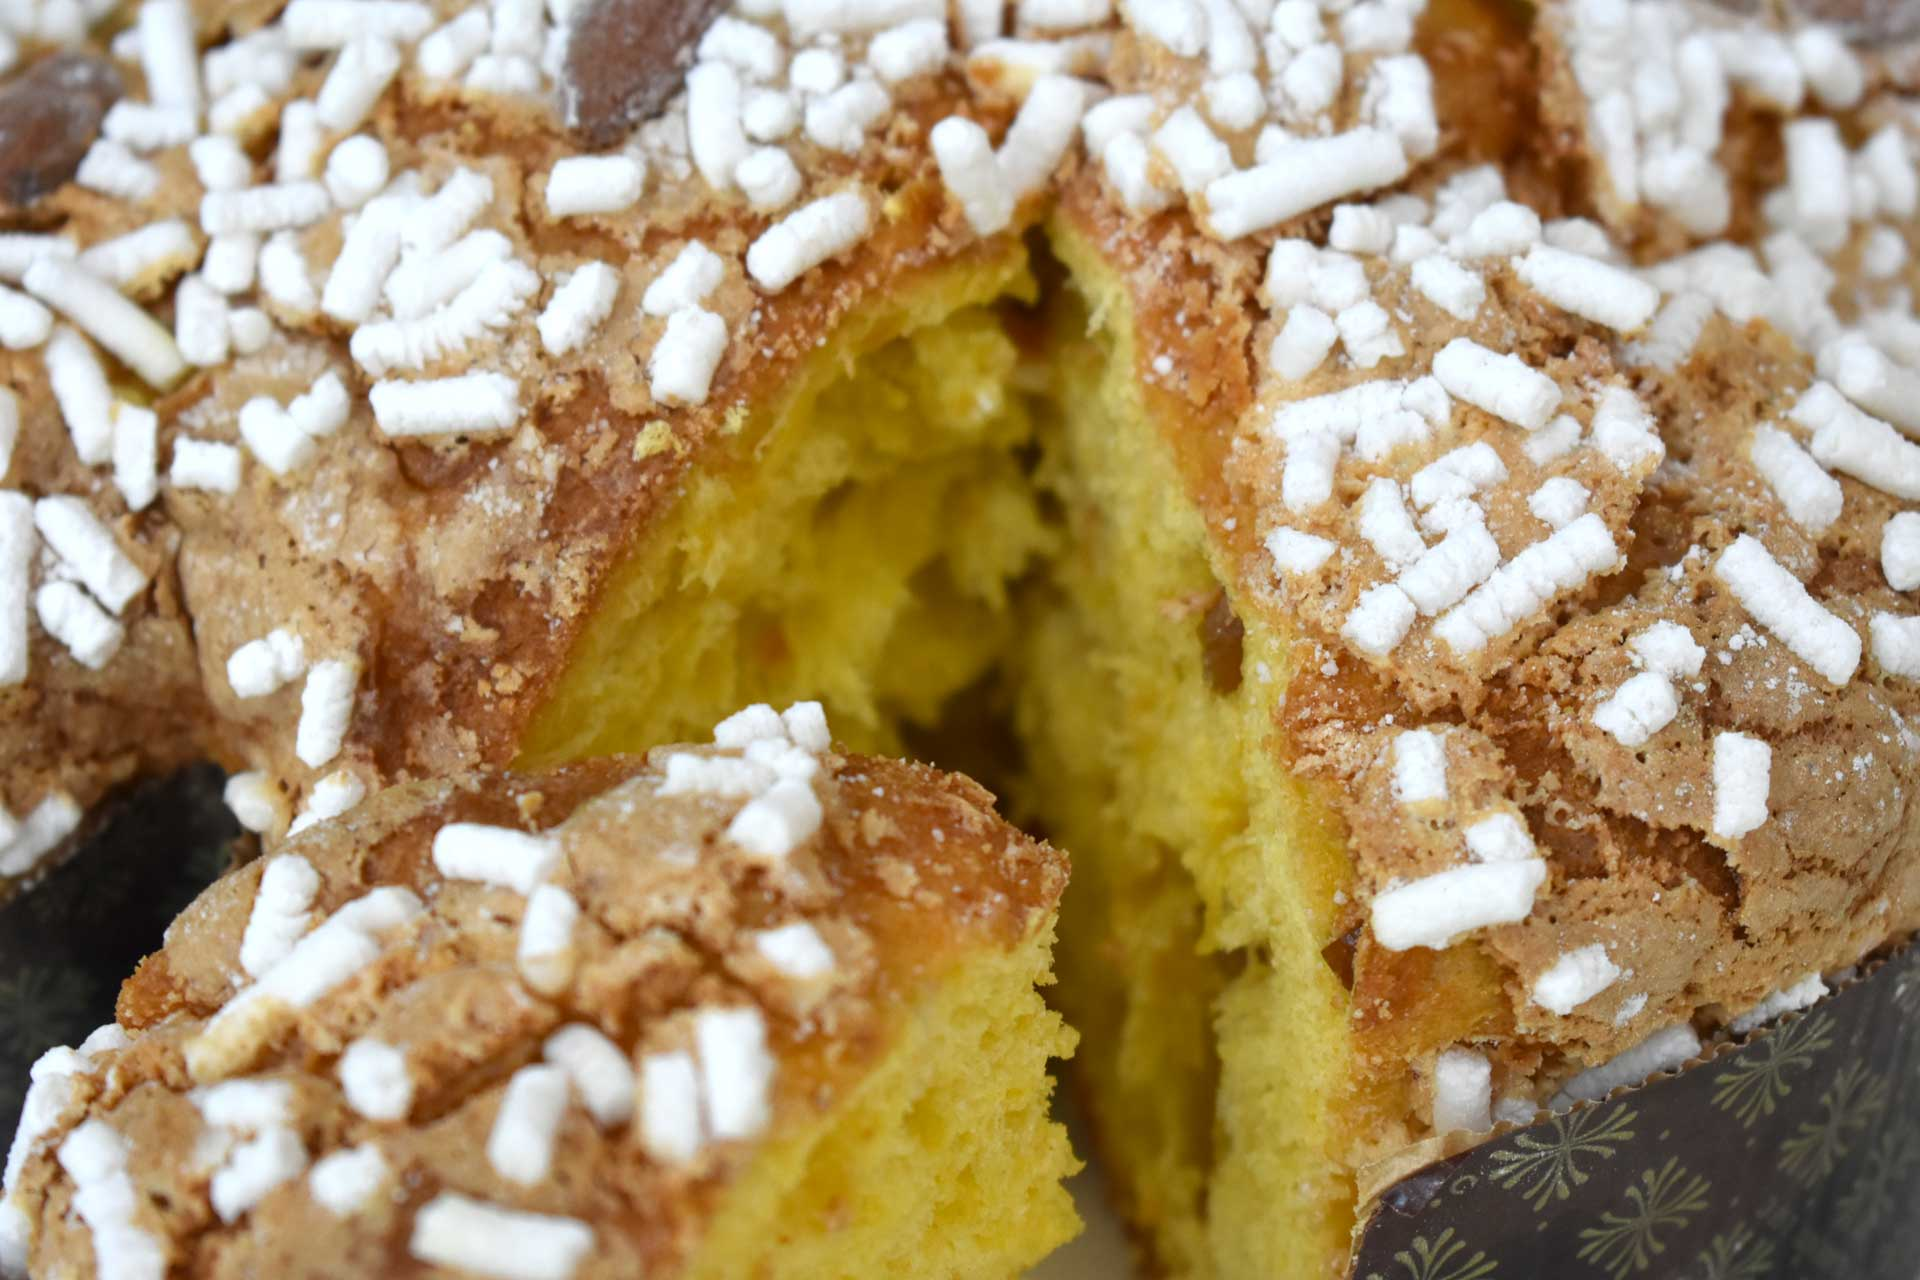 foodjoy-sweet-bakery-laboratorio-pasticceria-cantu-colomba-pasqua